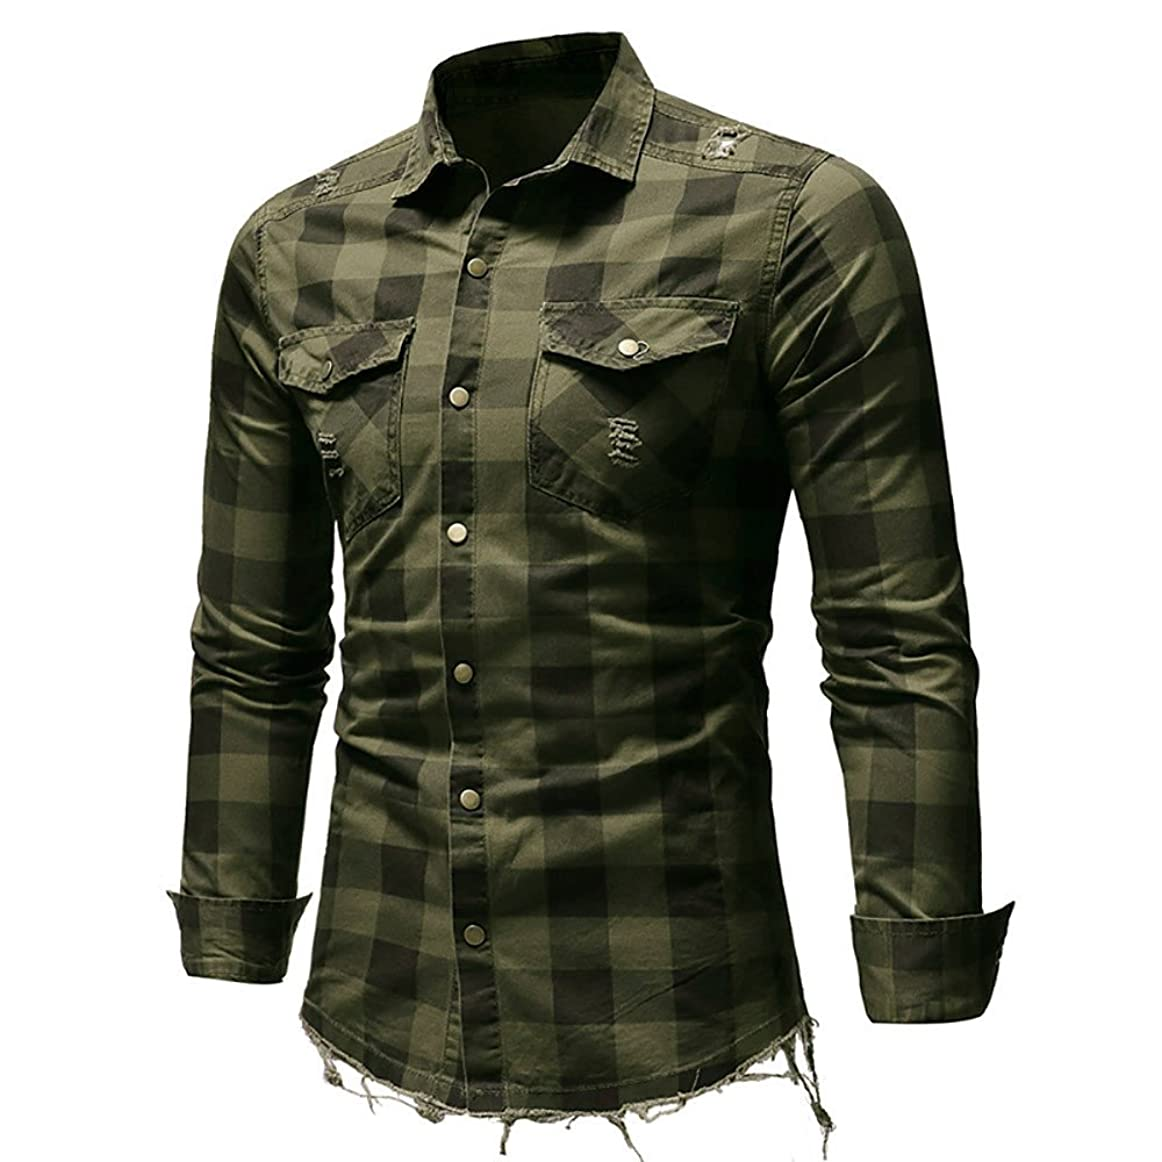 8f167bc6 mens turtleneck long sleeve shirts - kirillbugaev.com